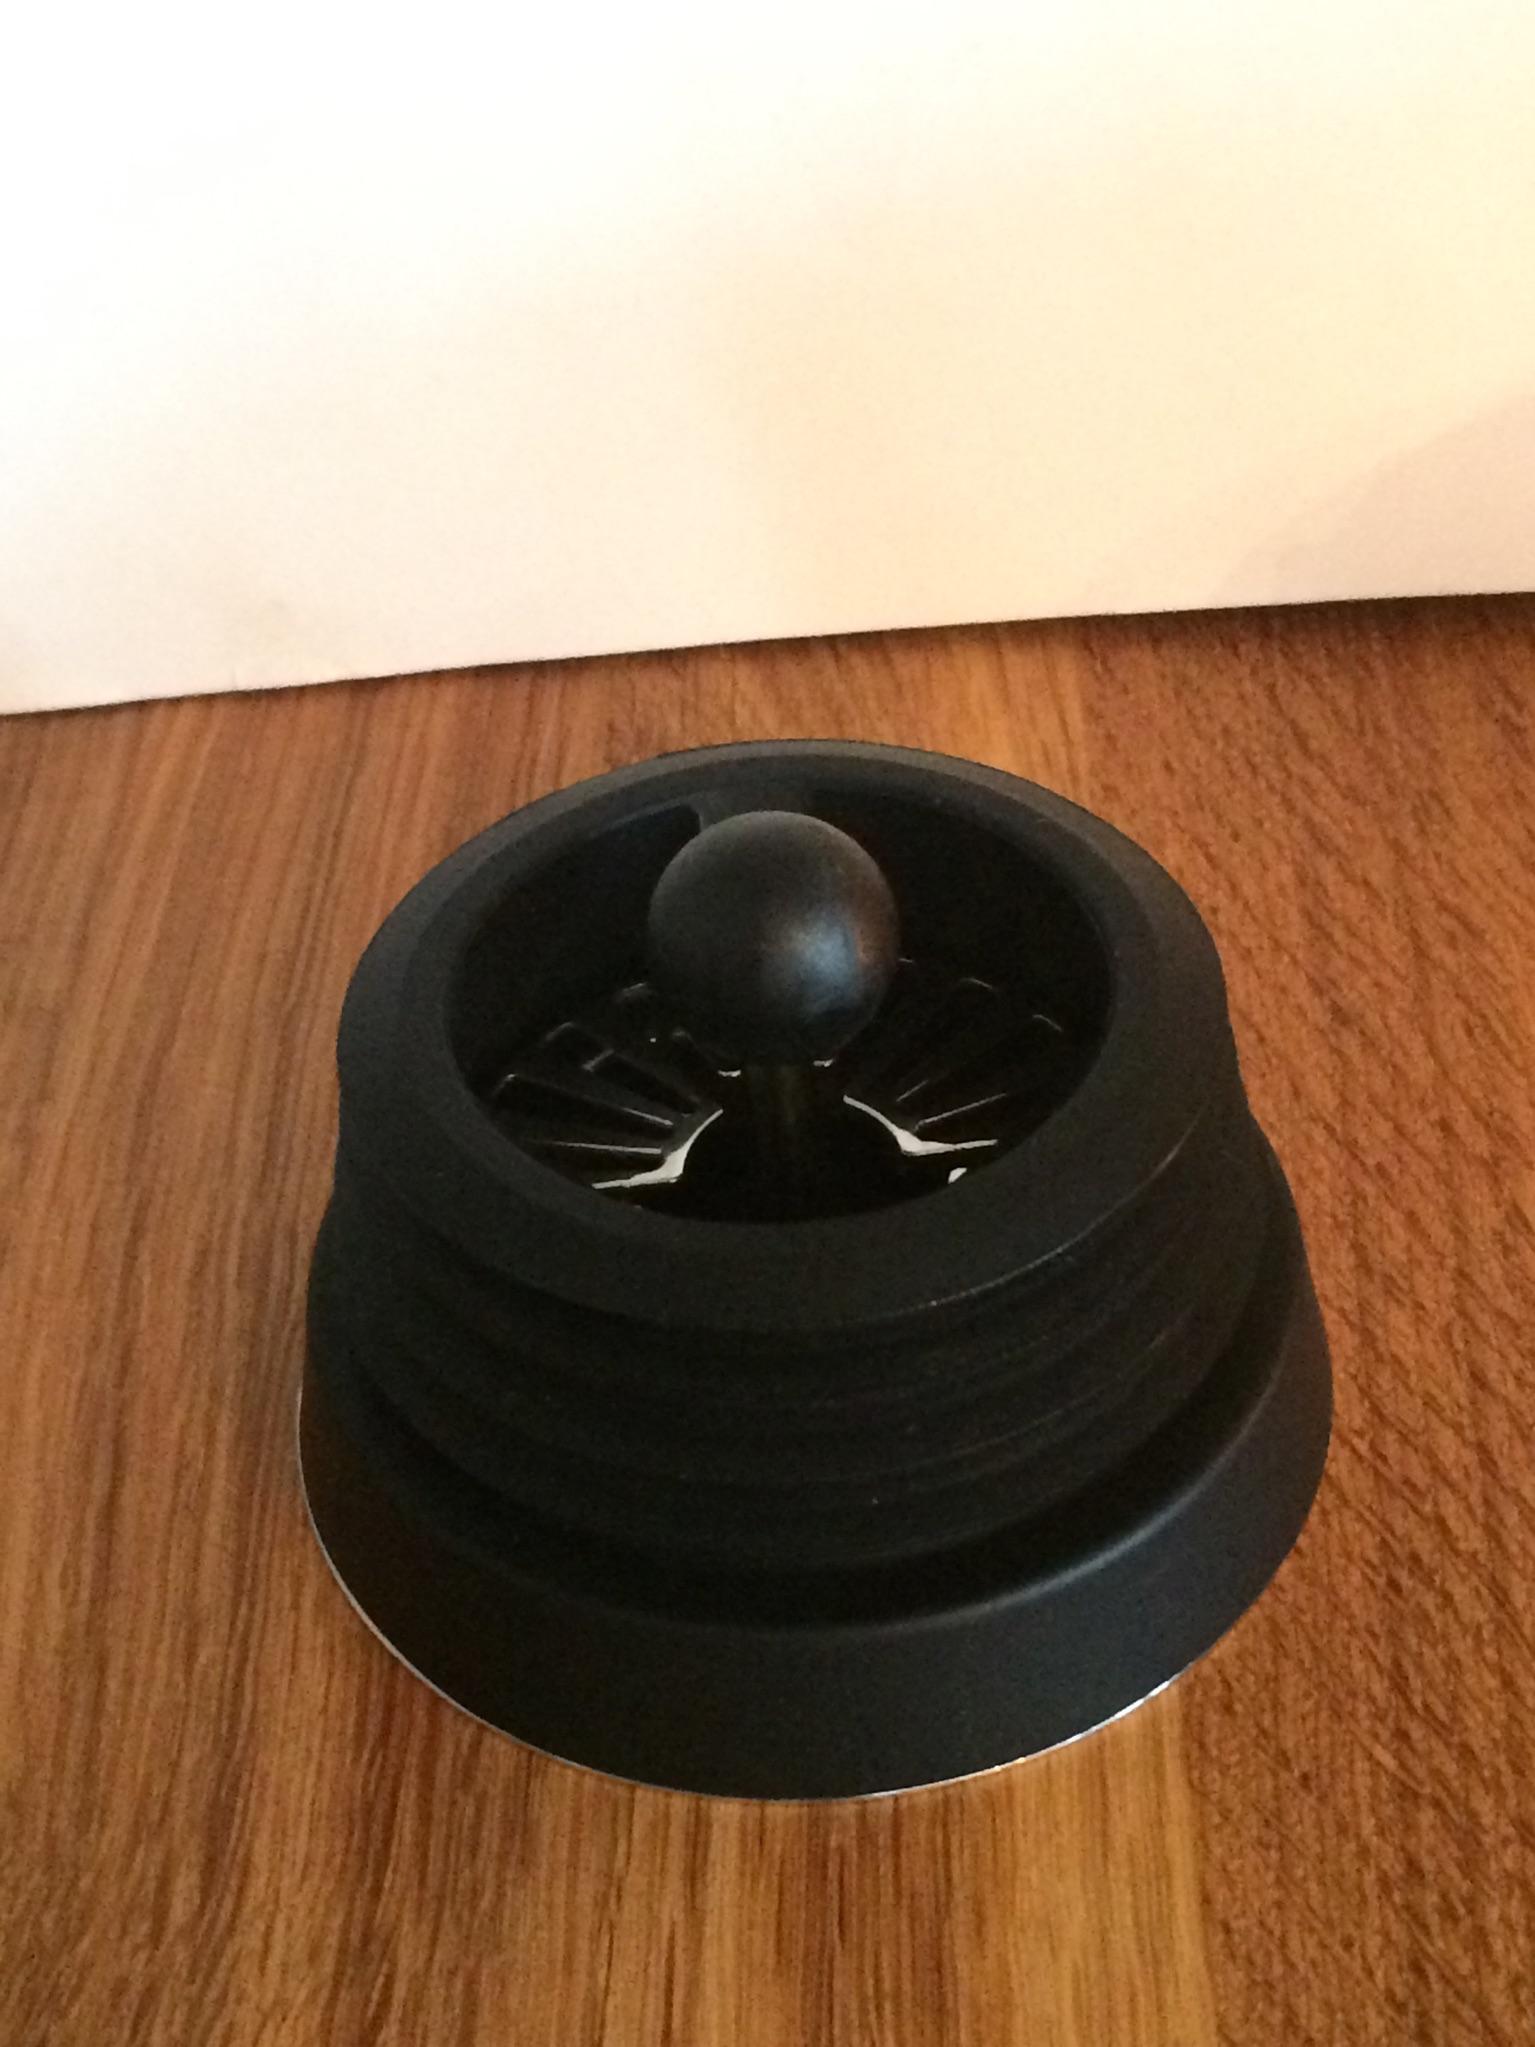 wmf deckel karaffe basic ersatzteil 6017709999 ebay. Black Bedroom Furniture Sets. Home Design Ideas